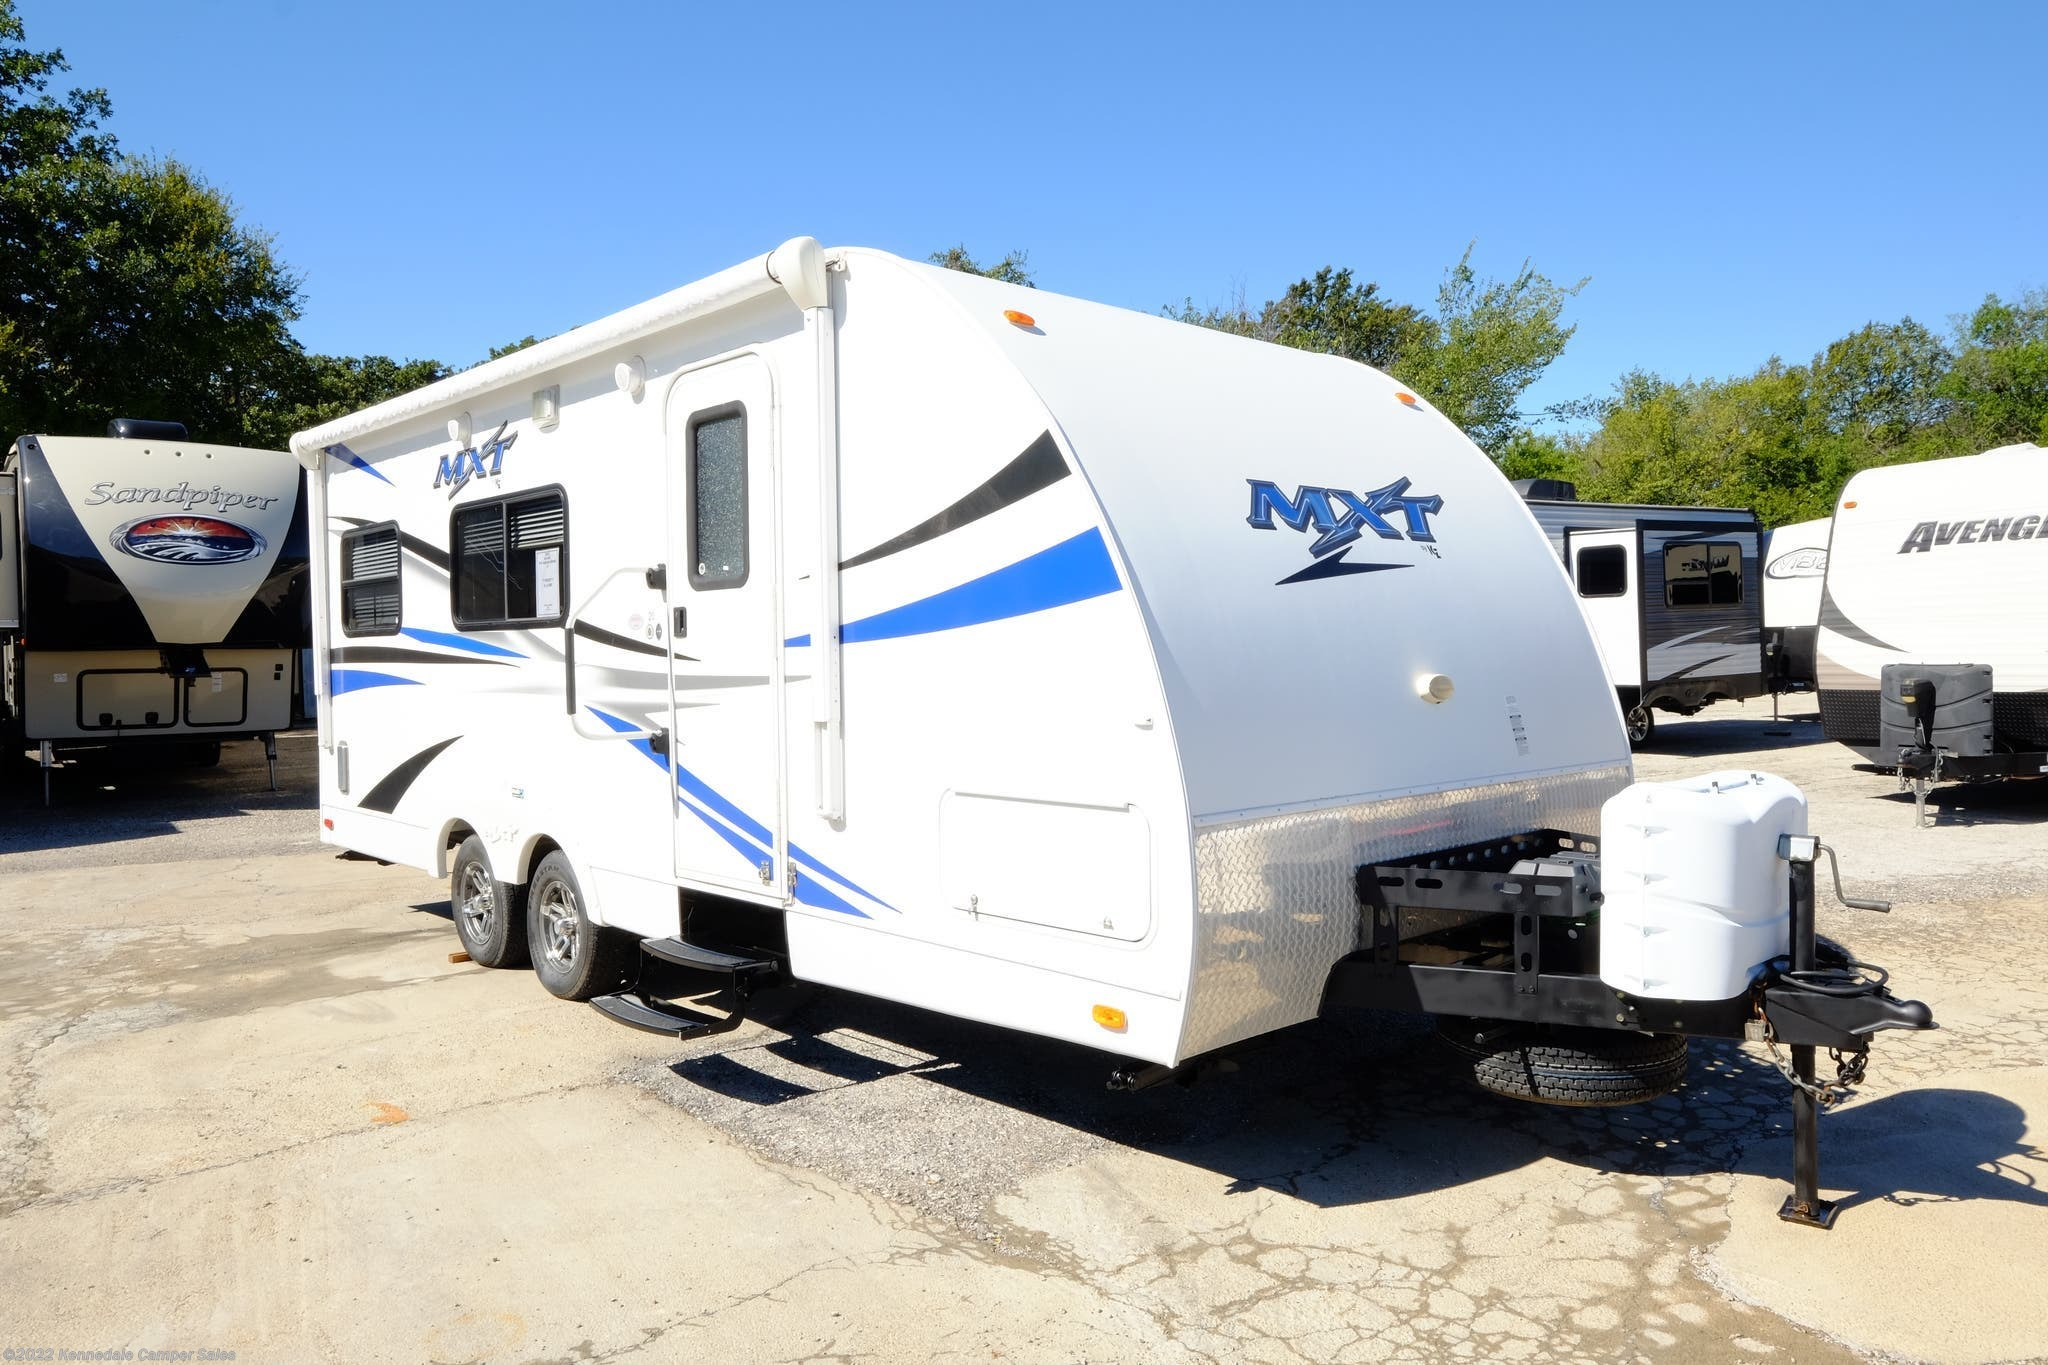 2013 K-Z RV MXT MXT200 TOY HAULER for Sale in Kennedale, TX 76060   101229